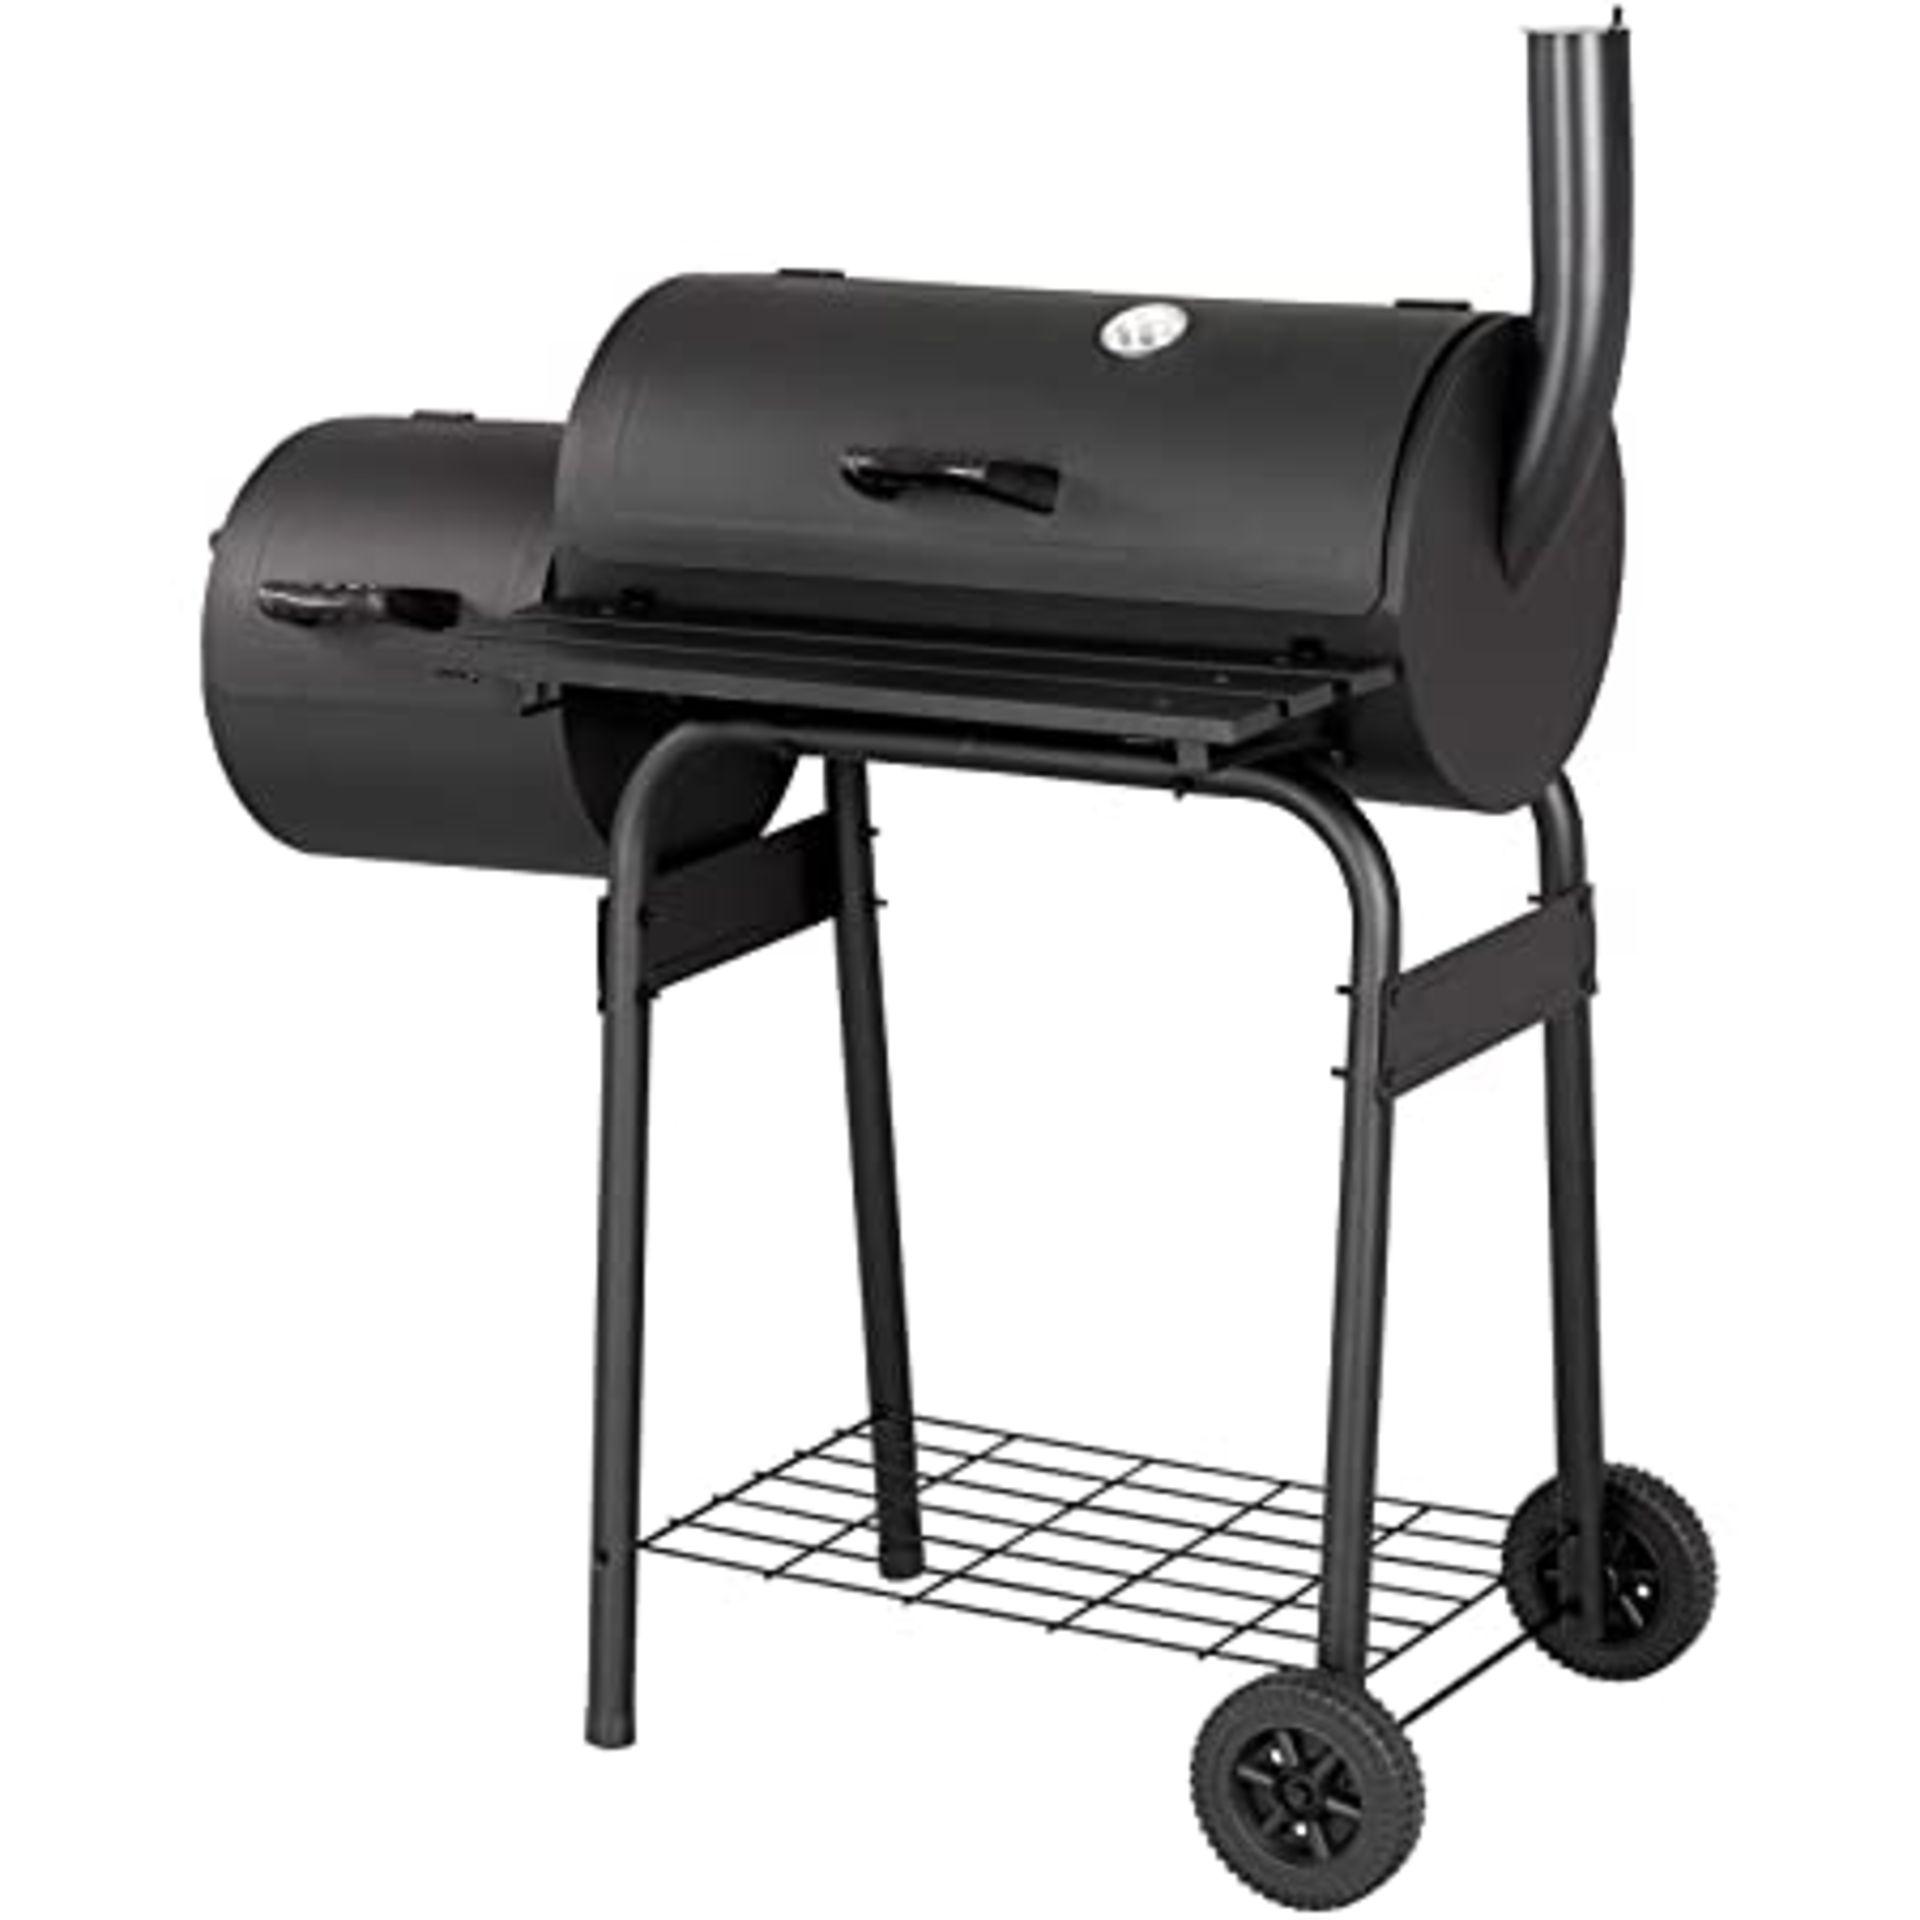 (P3) 1x Texas Starter Smoker & BBQ. Steel With Black Powder Coated Hood & Firebowl. (H114x W103x - Image 2 of 3